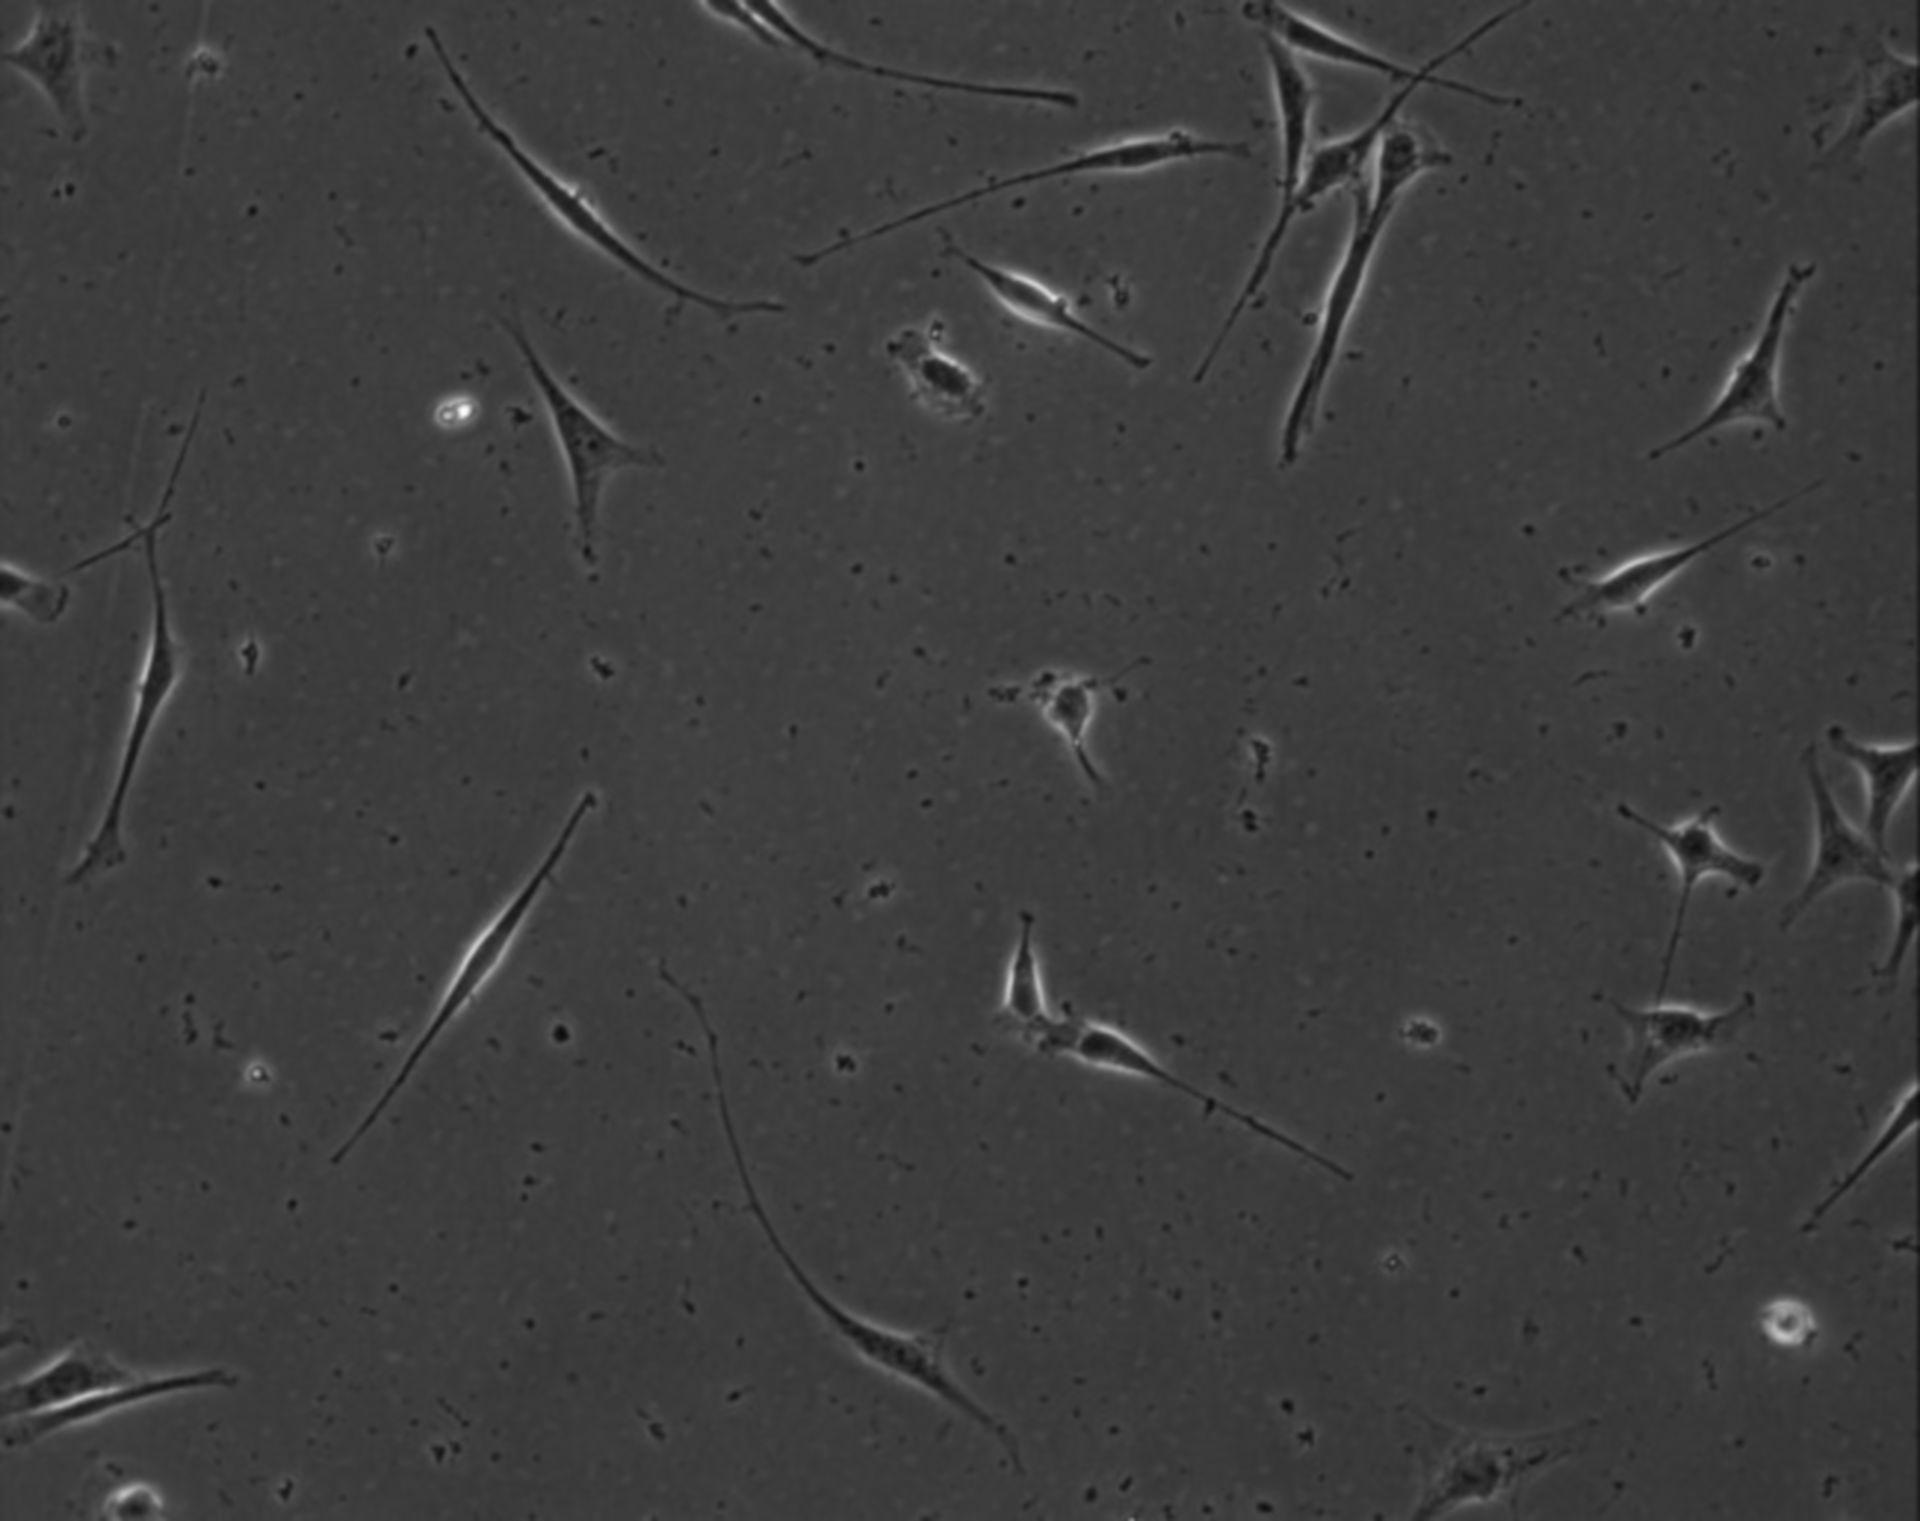 Mus musculus (Extracellular matrix part) - CIL:8920